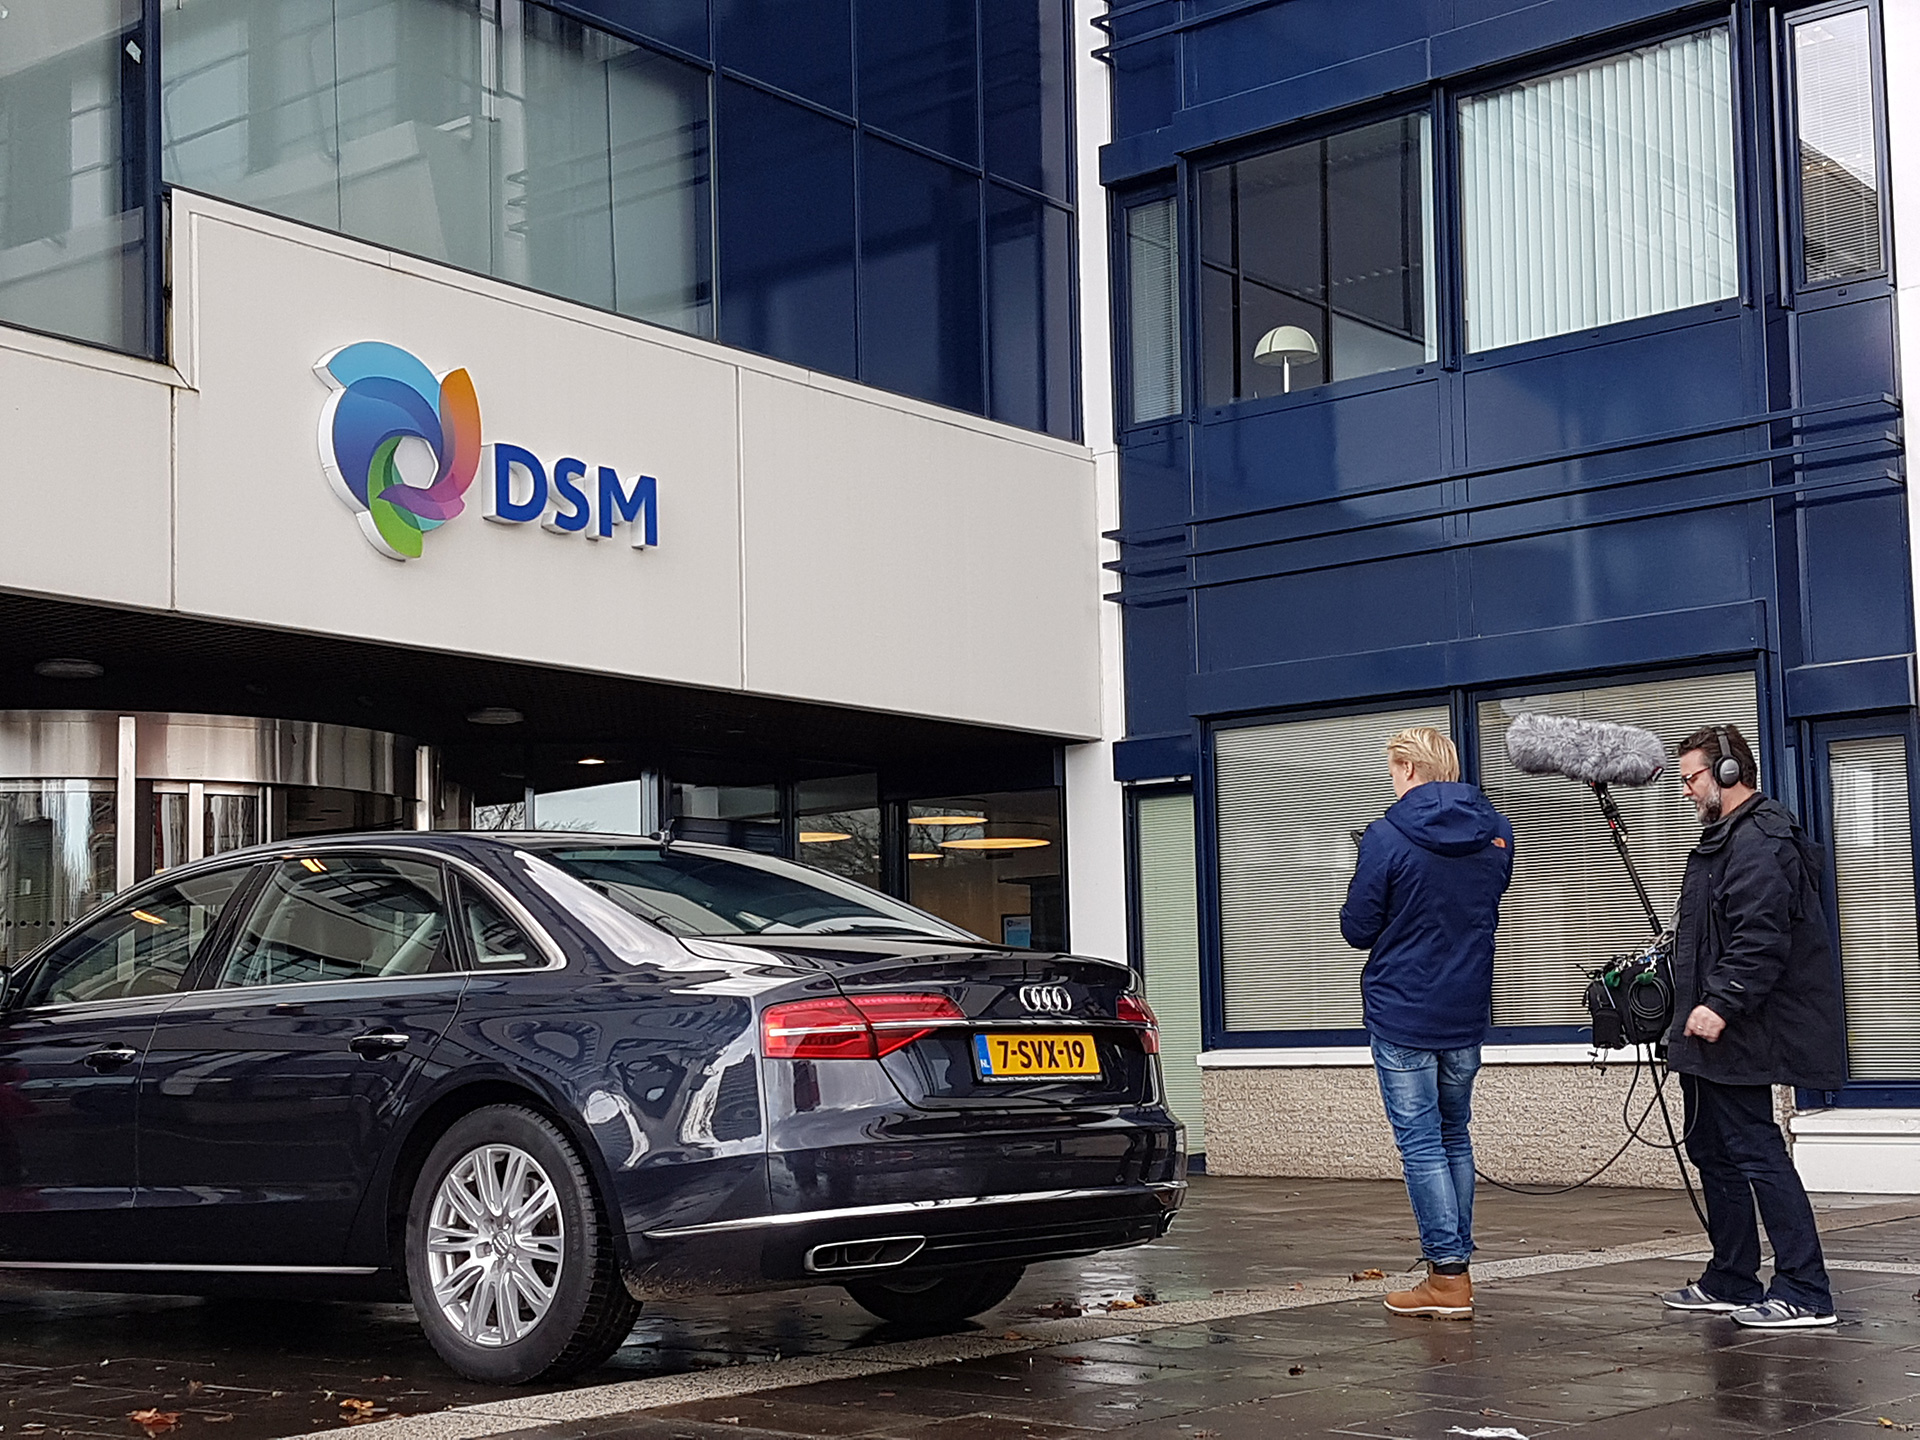 DSM en CCD Media achter de schermen